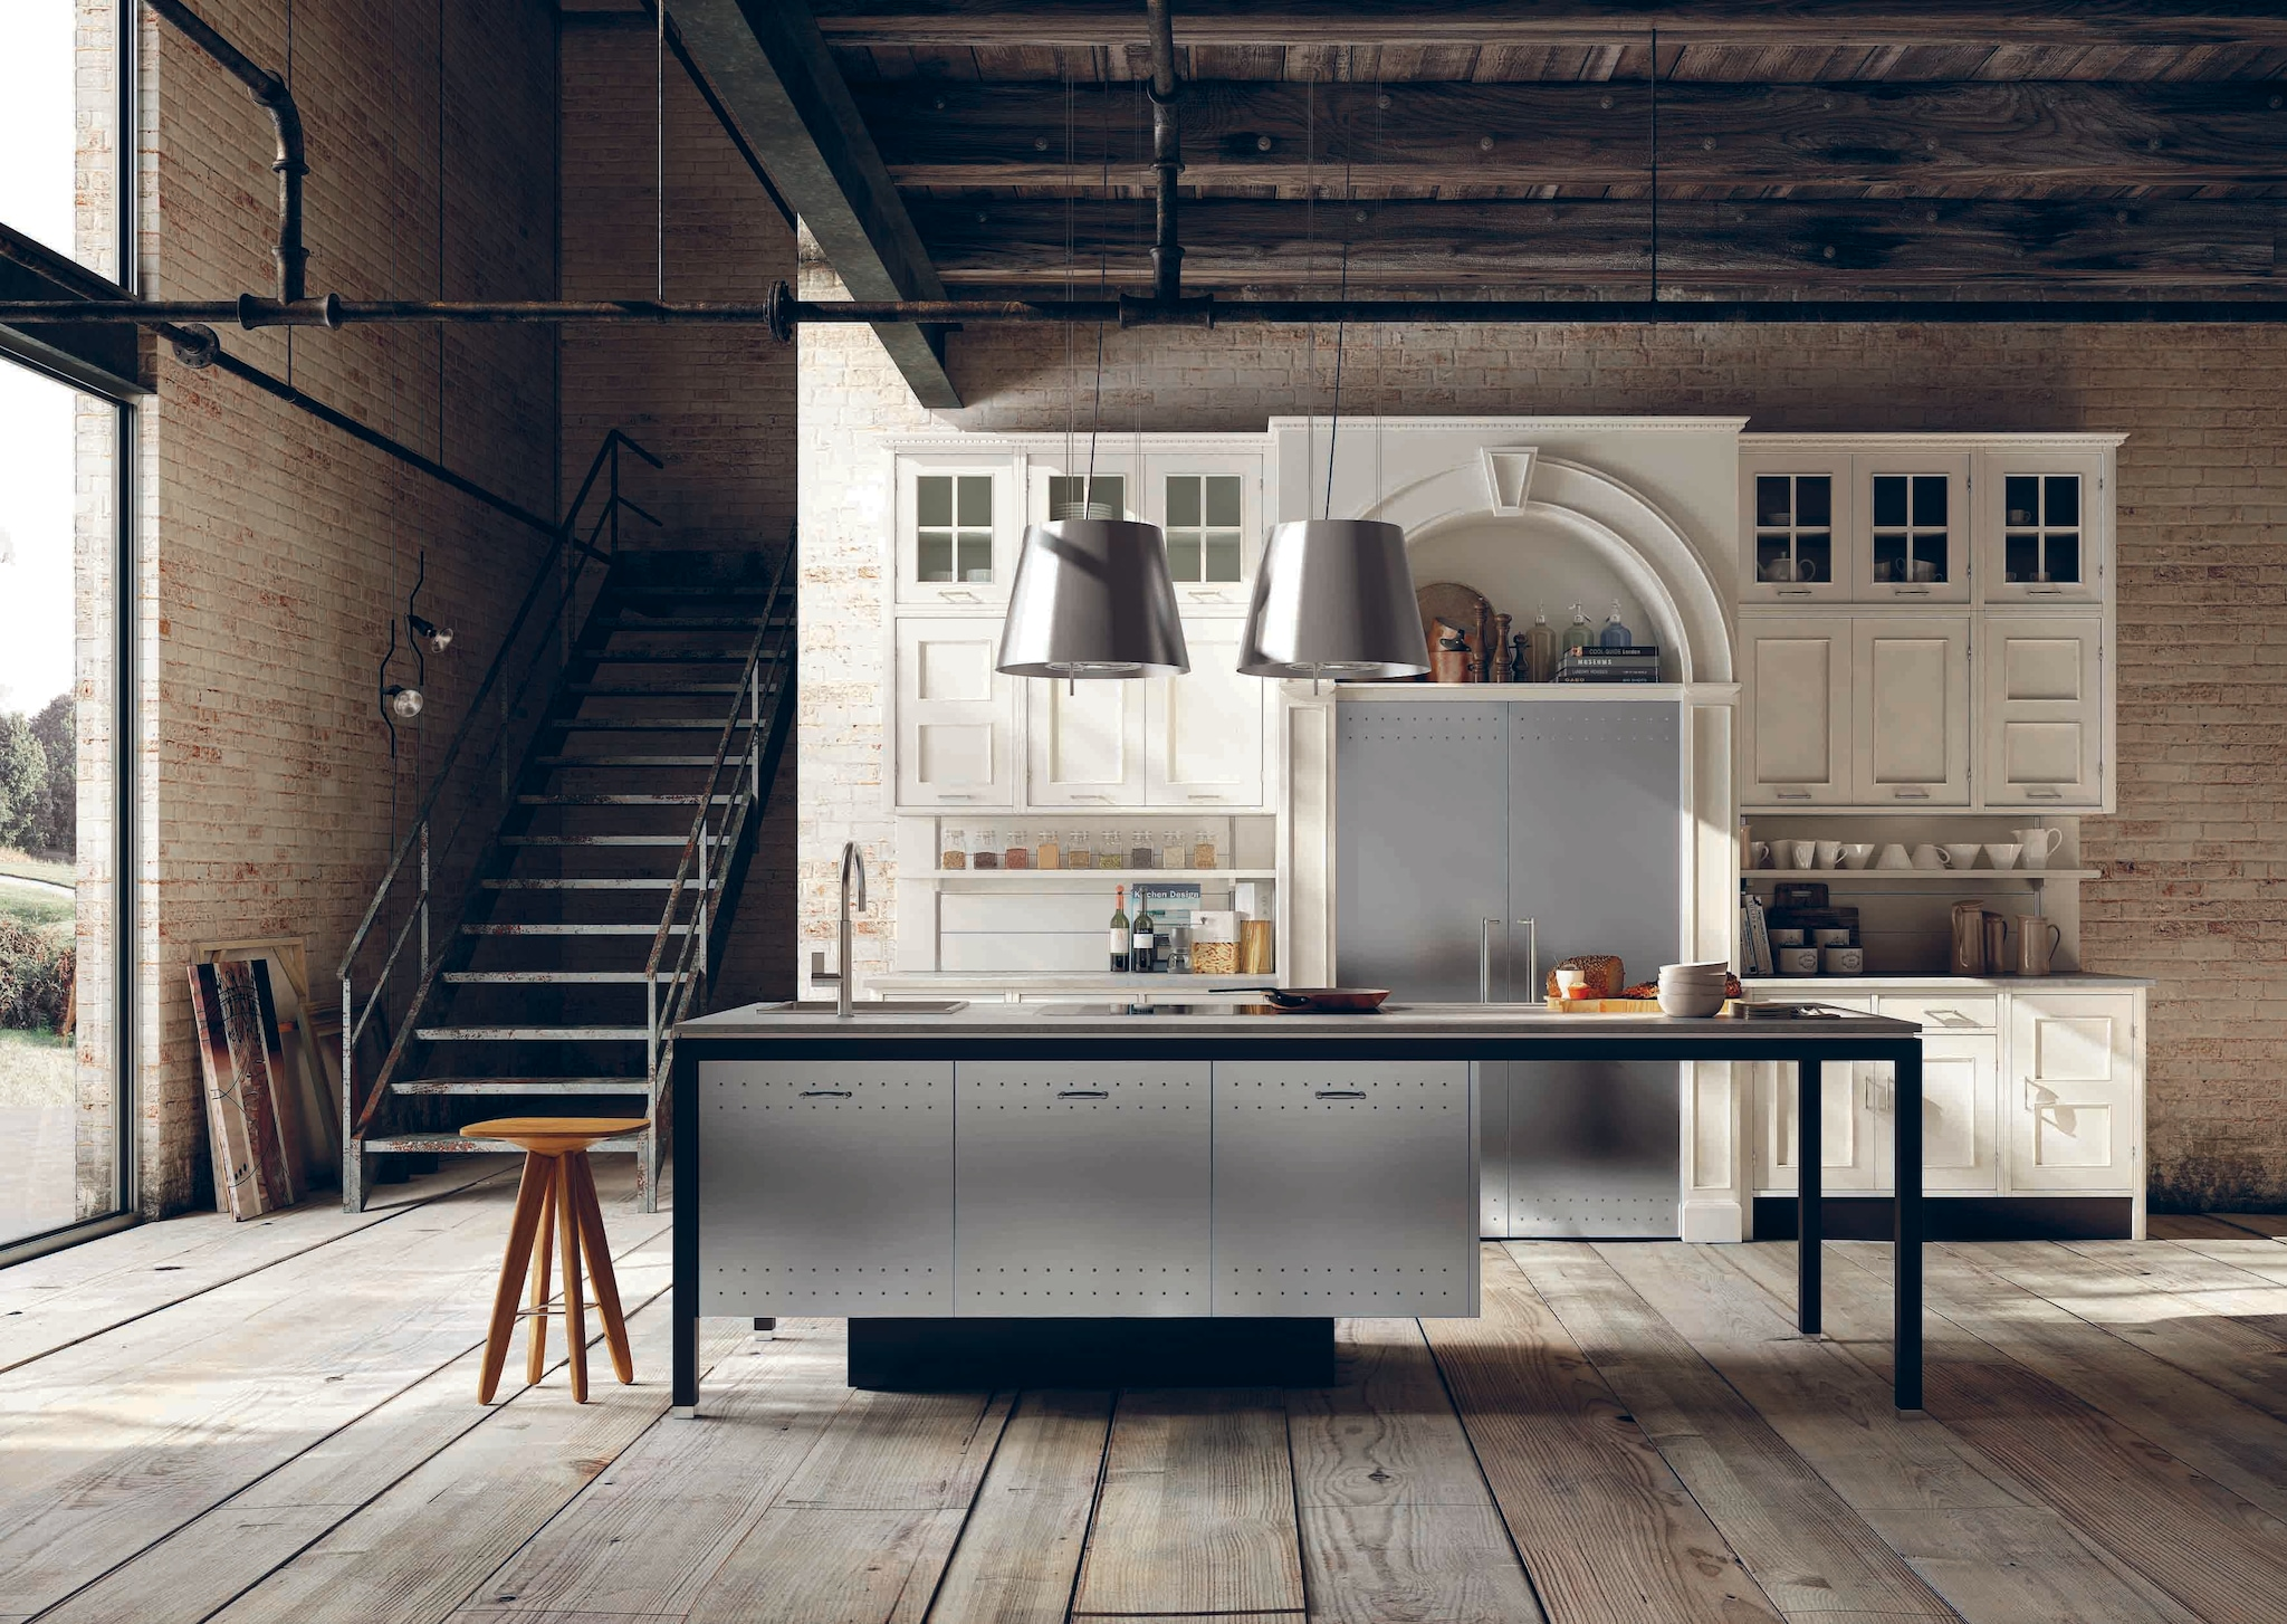 40 anni di cucine interni magazine - Marche cucine moderne ...